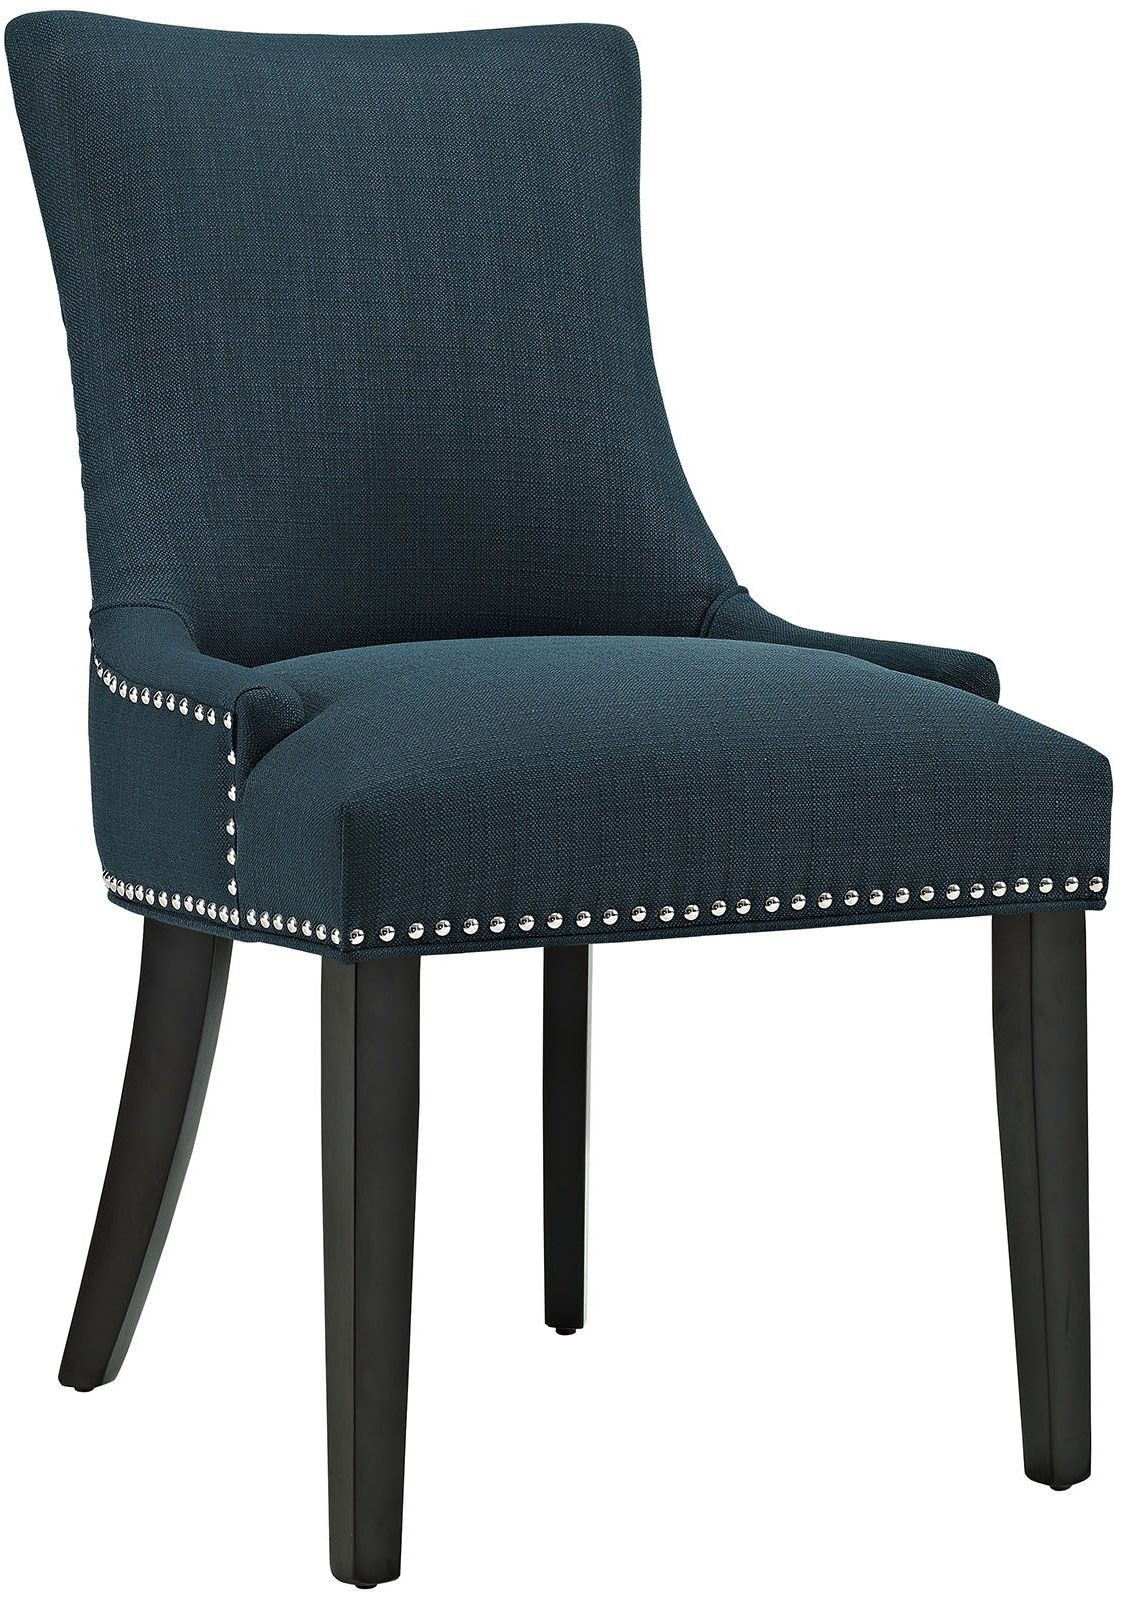 Marquis Azure Upholstered Dining Chair Eei 2229 Azu